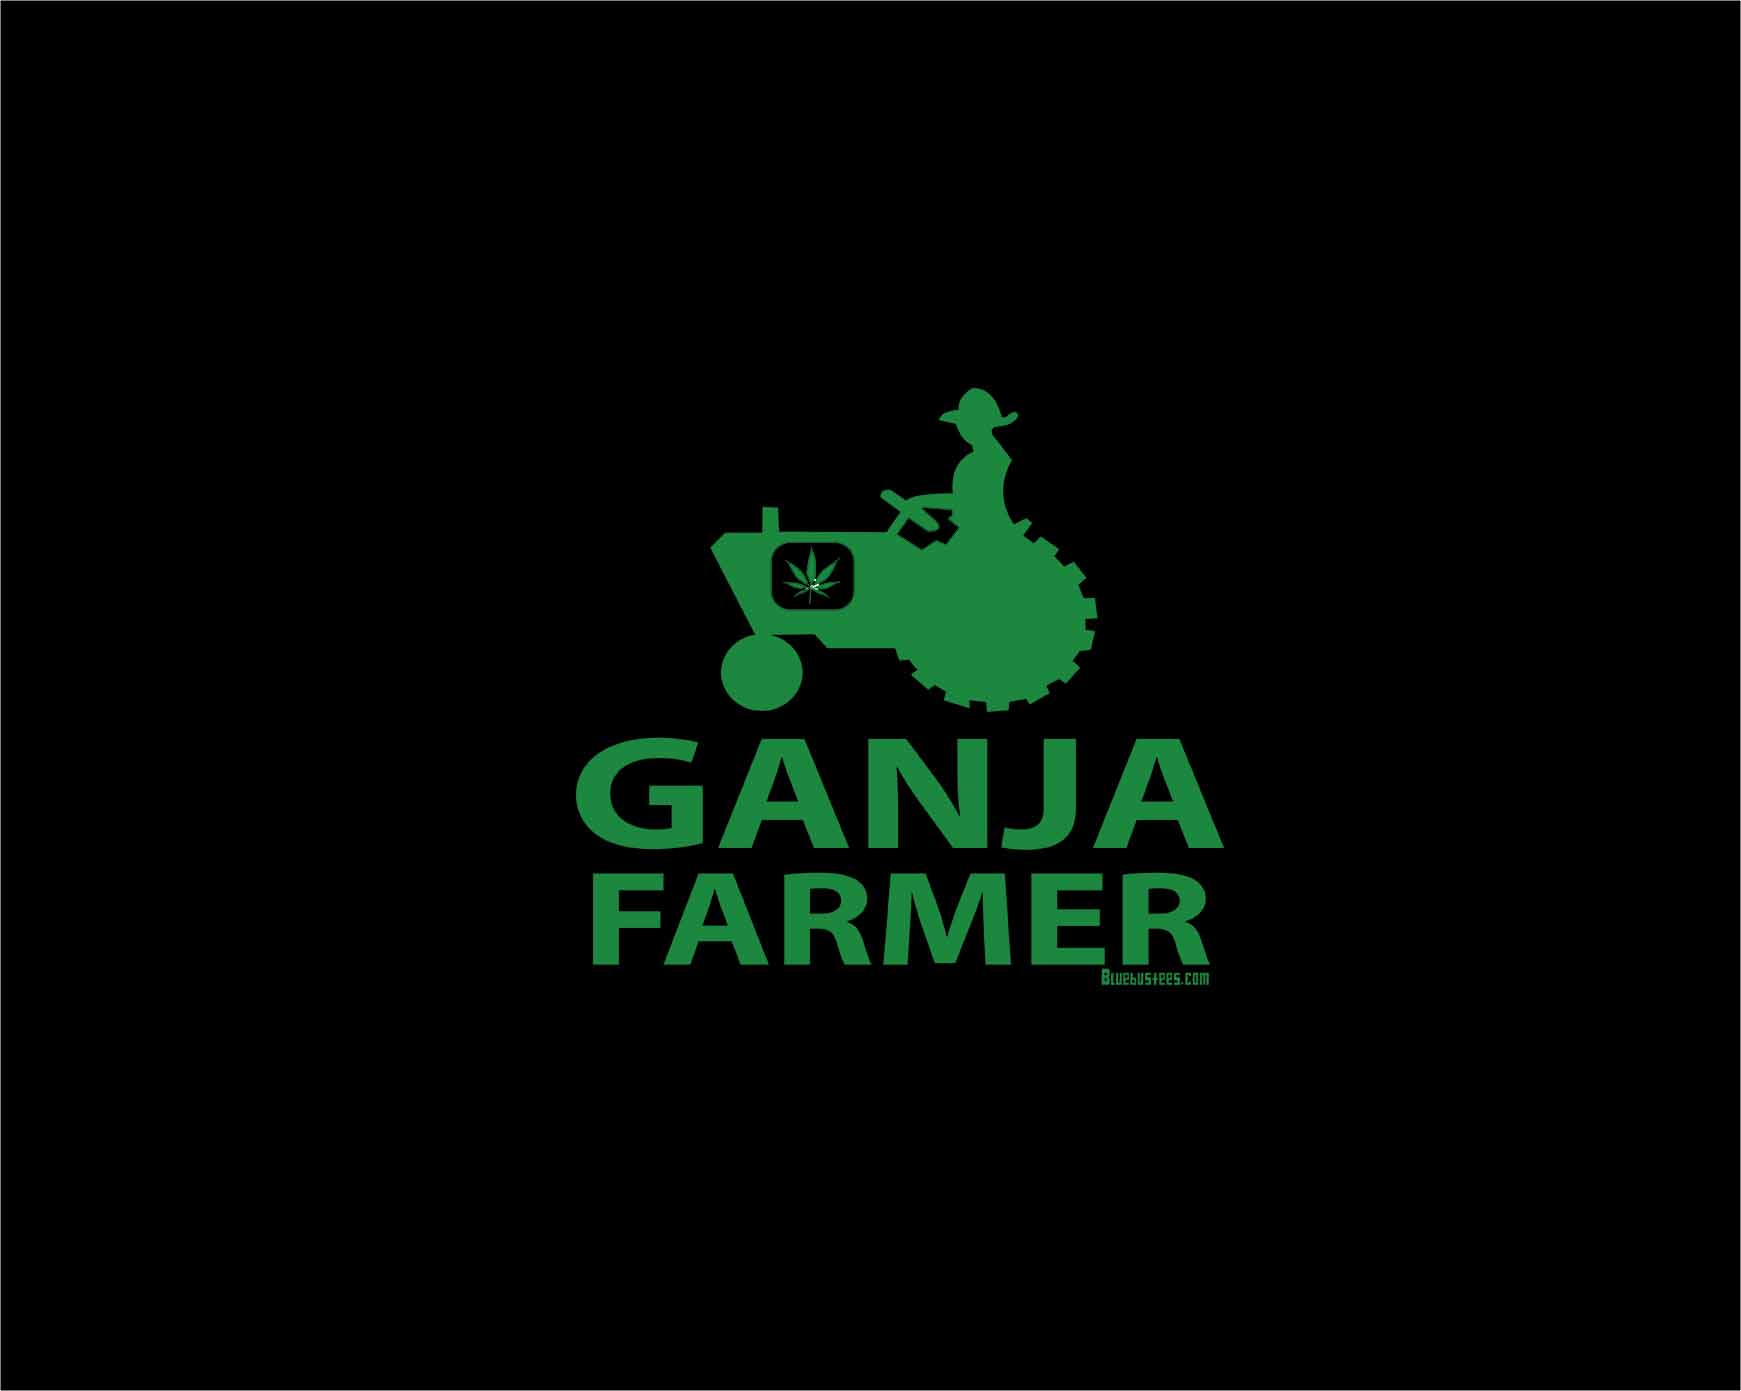 GANJA-FARMER